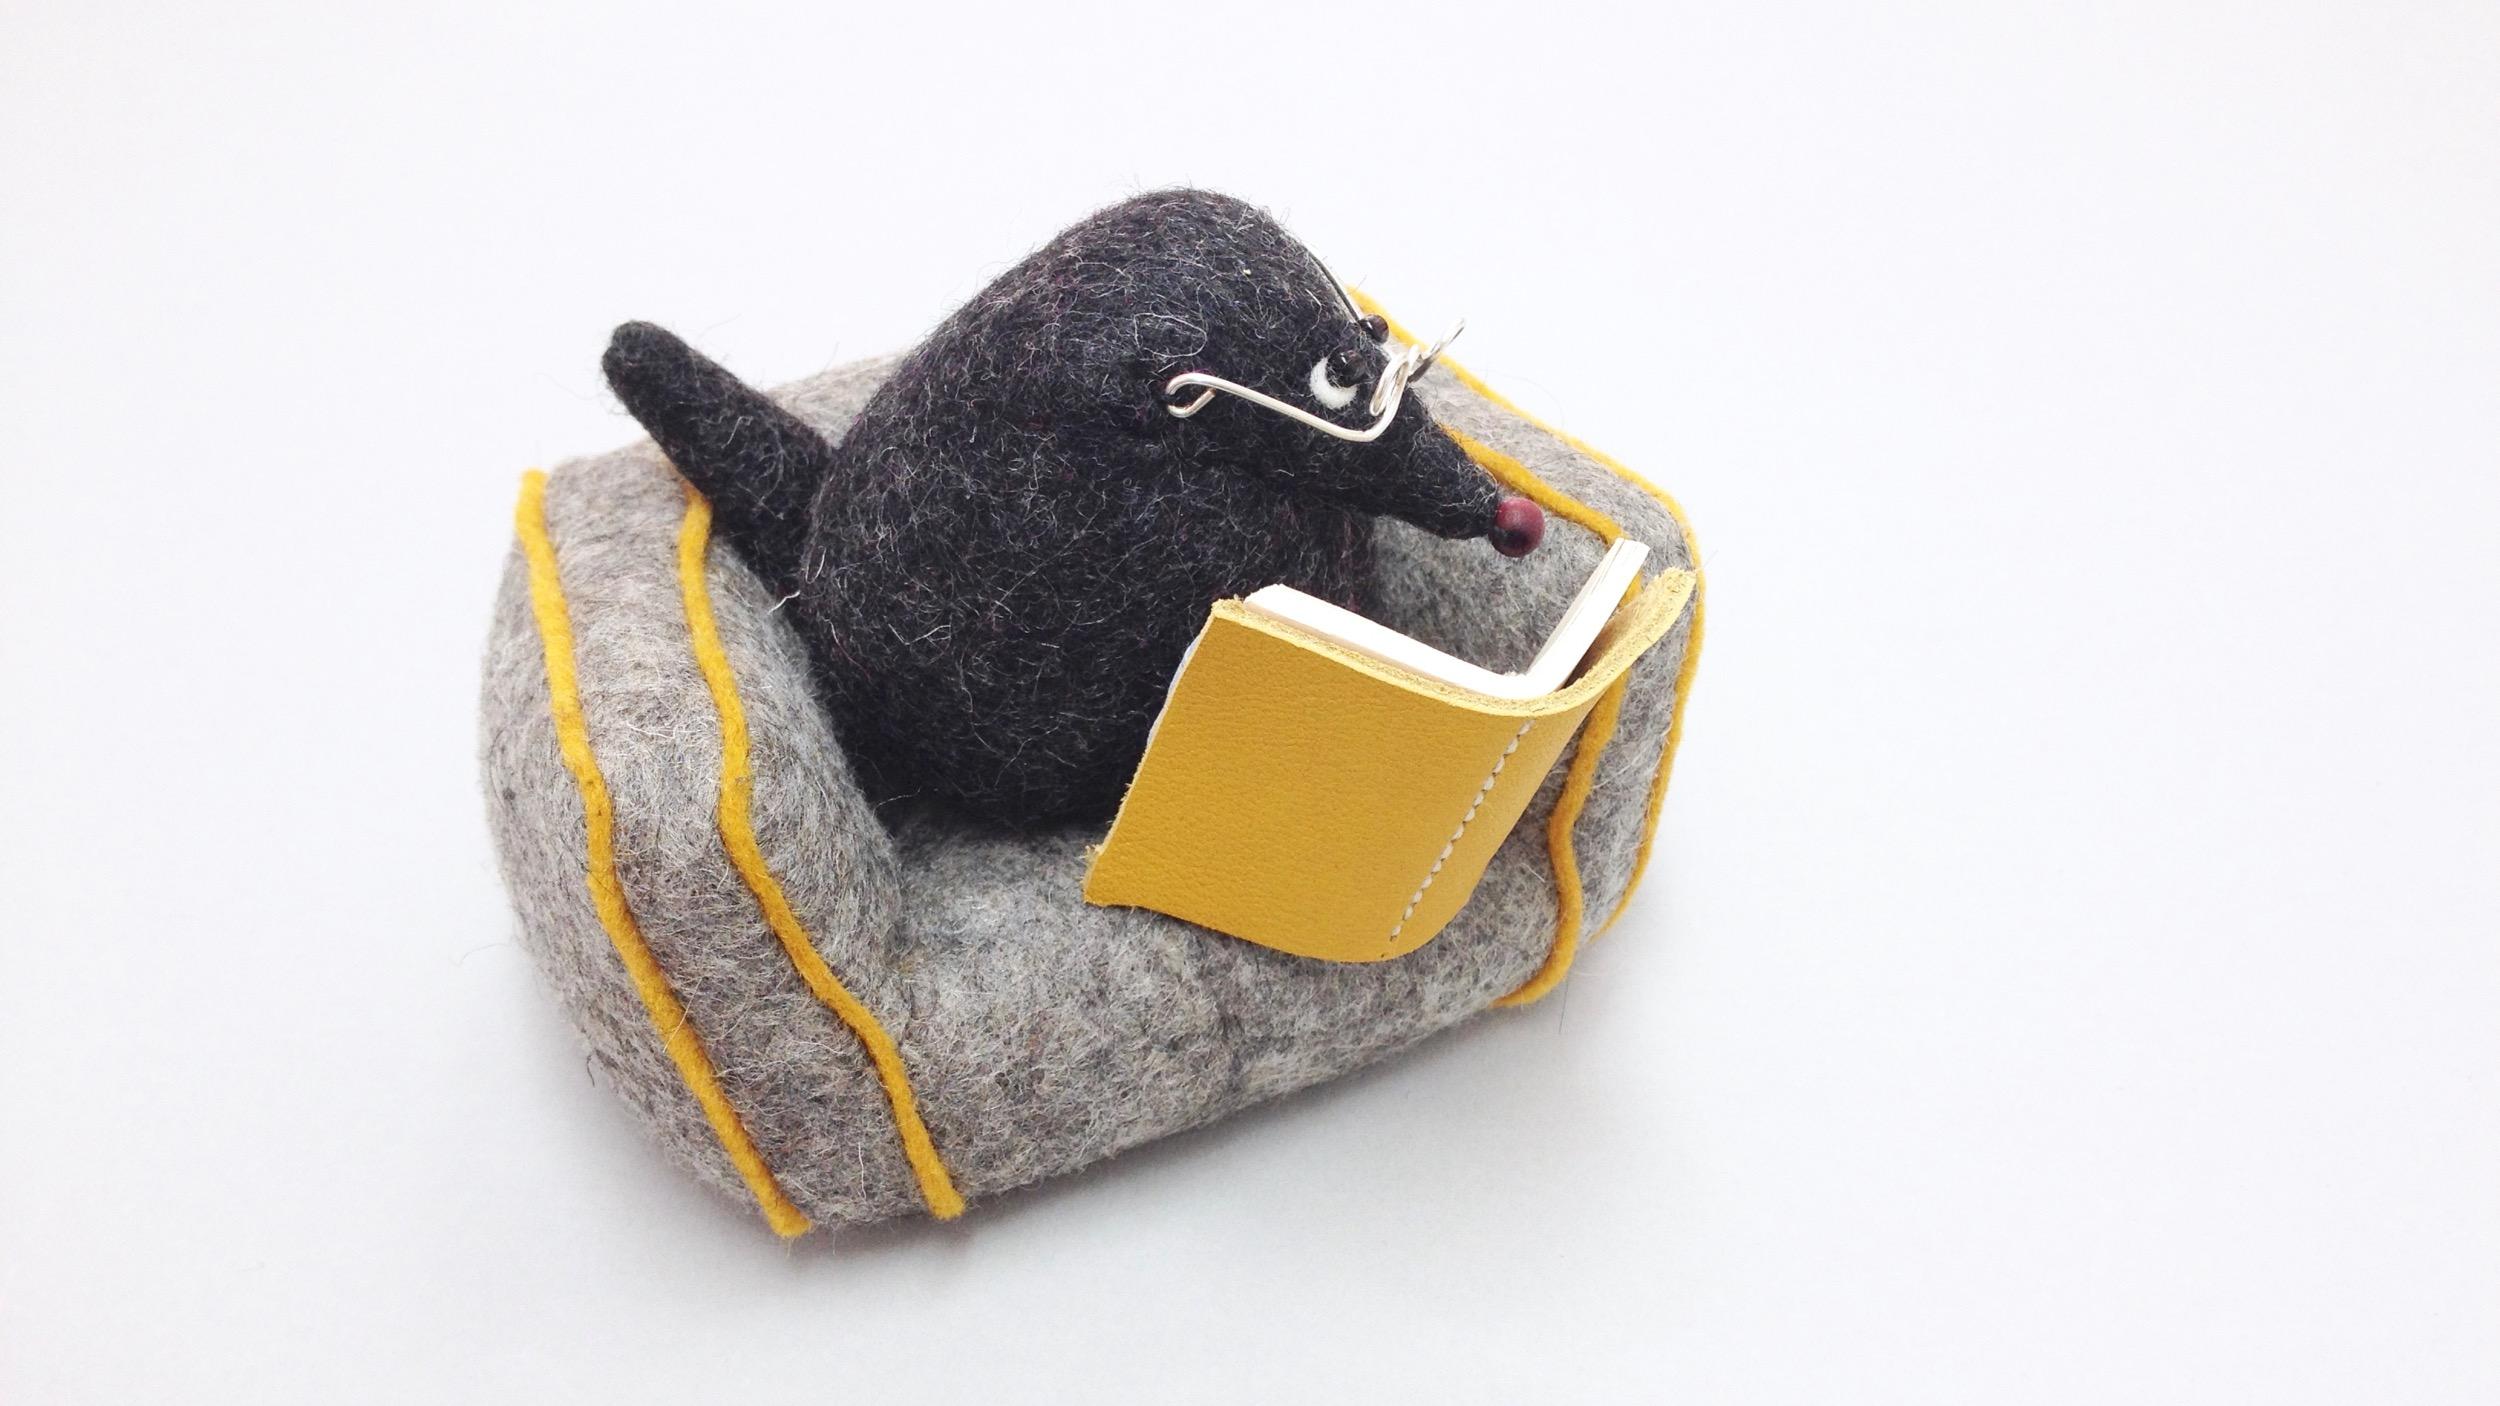 Bilberry Woods character Mr Mole animal figurine handmade from wool felt by Laura Mirjami | Mirjami Design.jpg